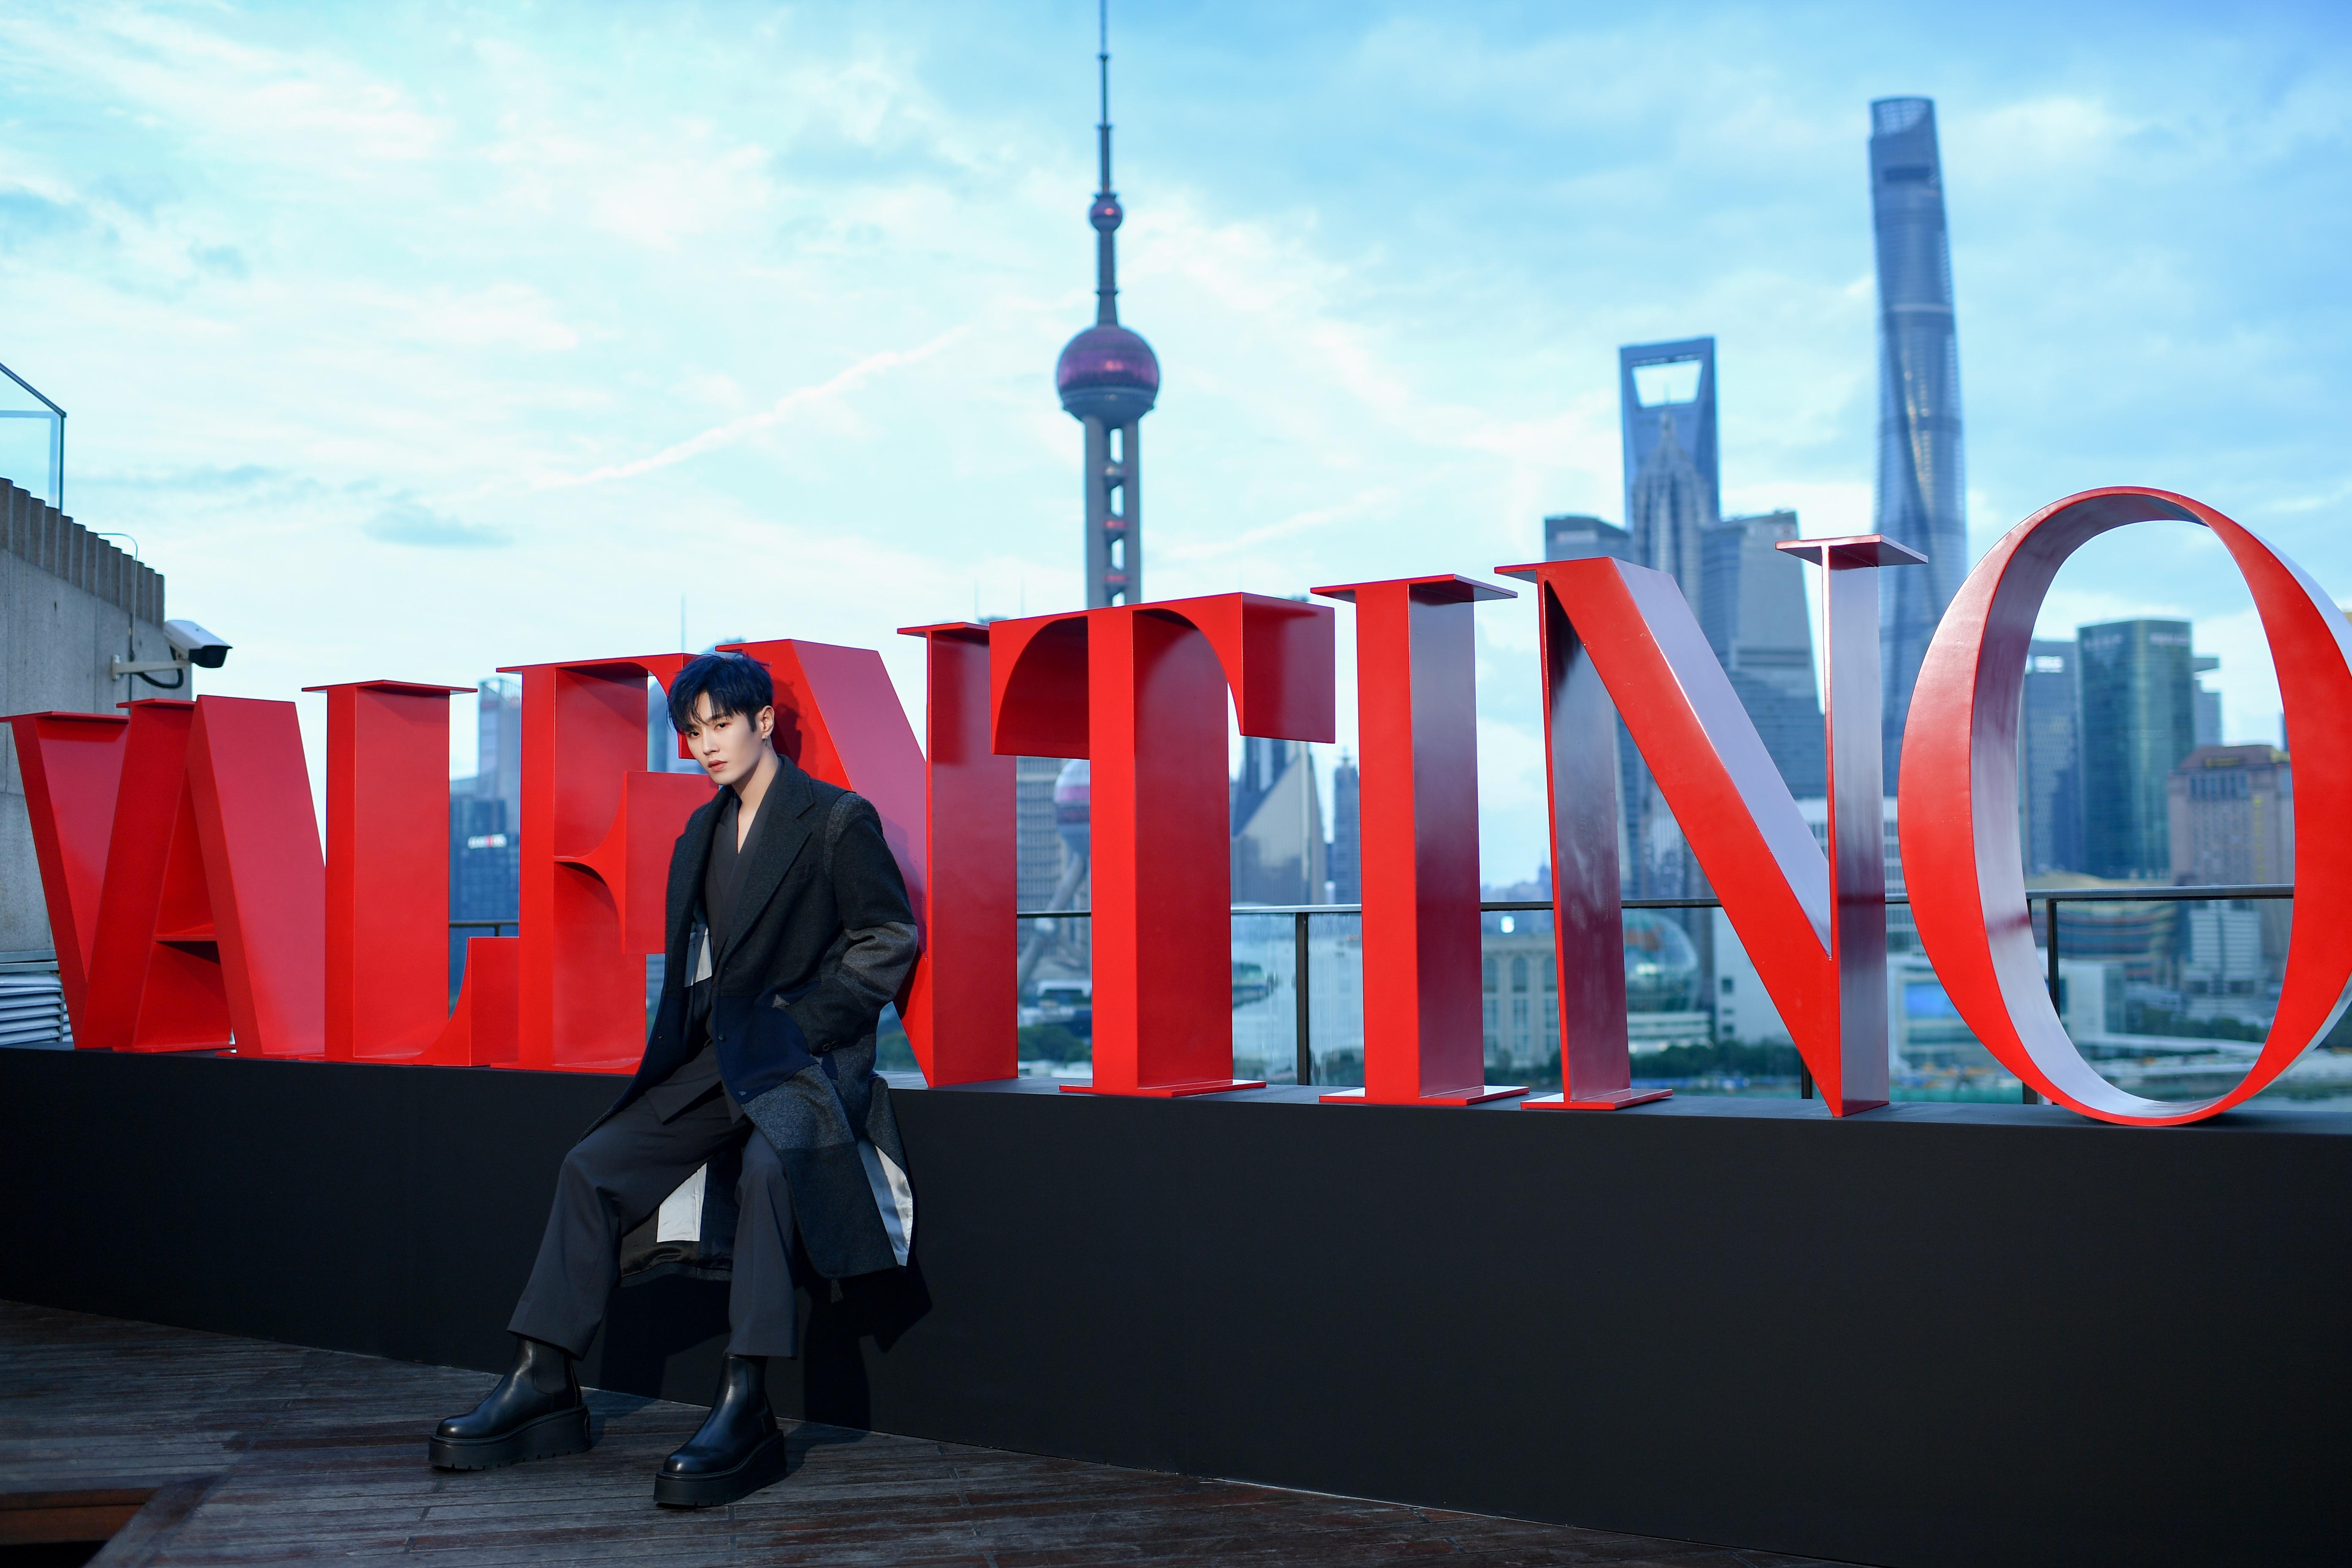 Valentino took over Sir Elly's Bar & Restaurant at Shanghai's Peninsula hotel.